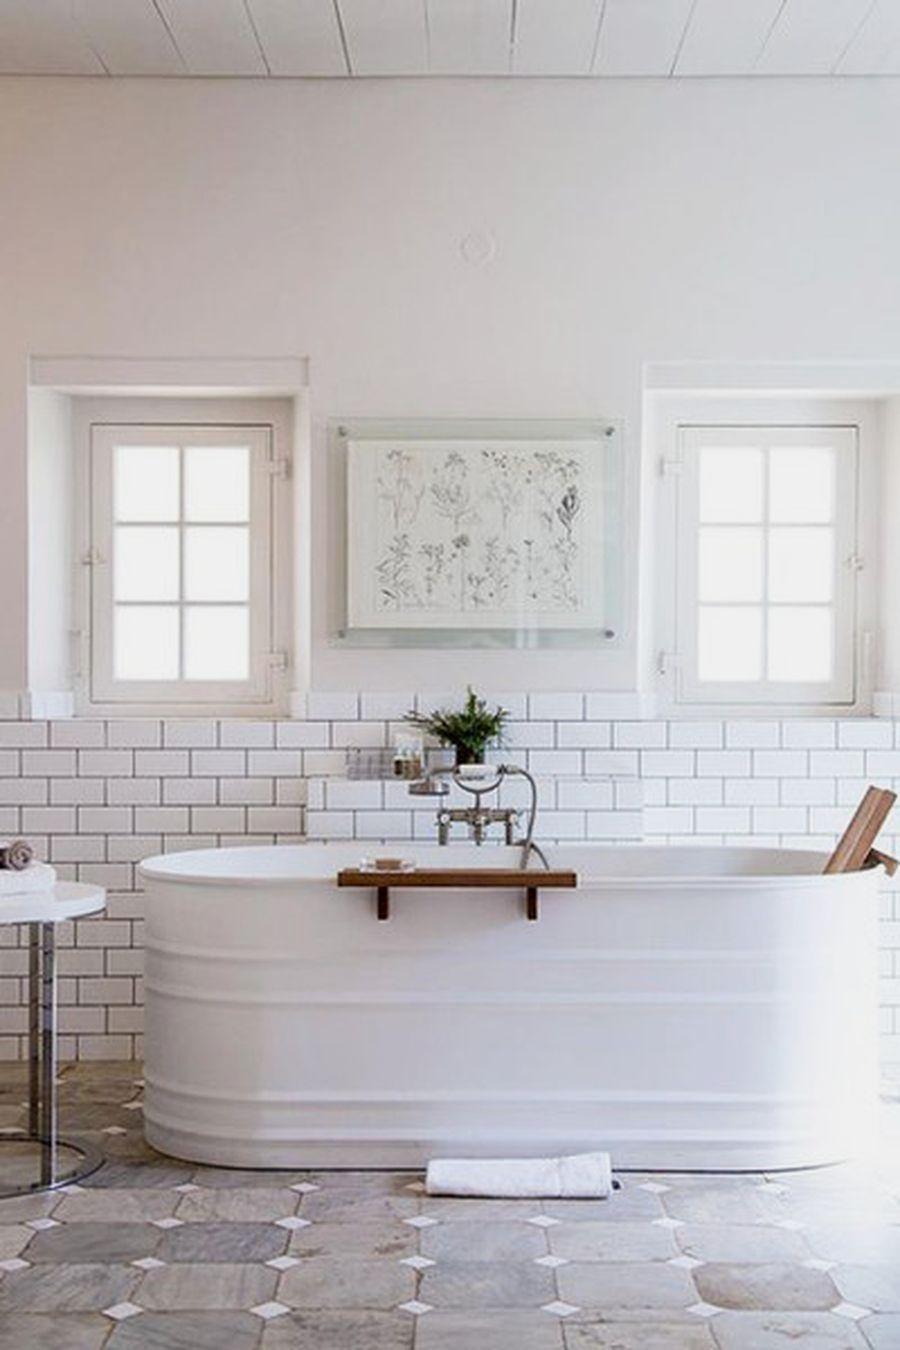 12 Awesome Farmhouse Bathroom Renovation Designs For Your Bathroom